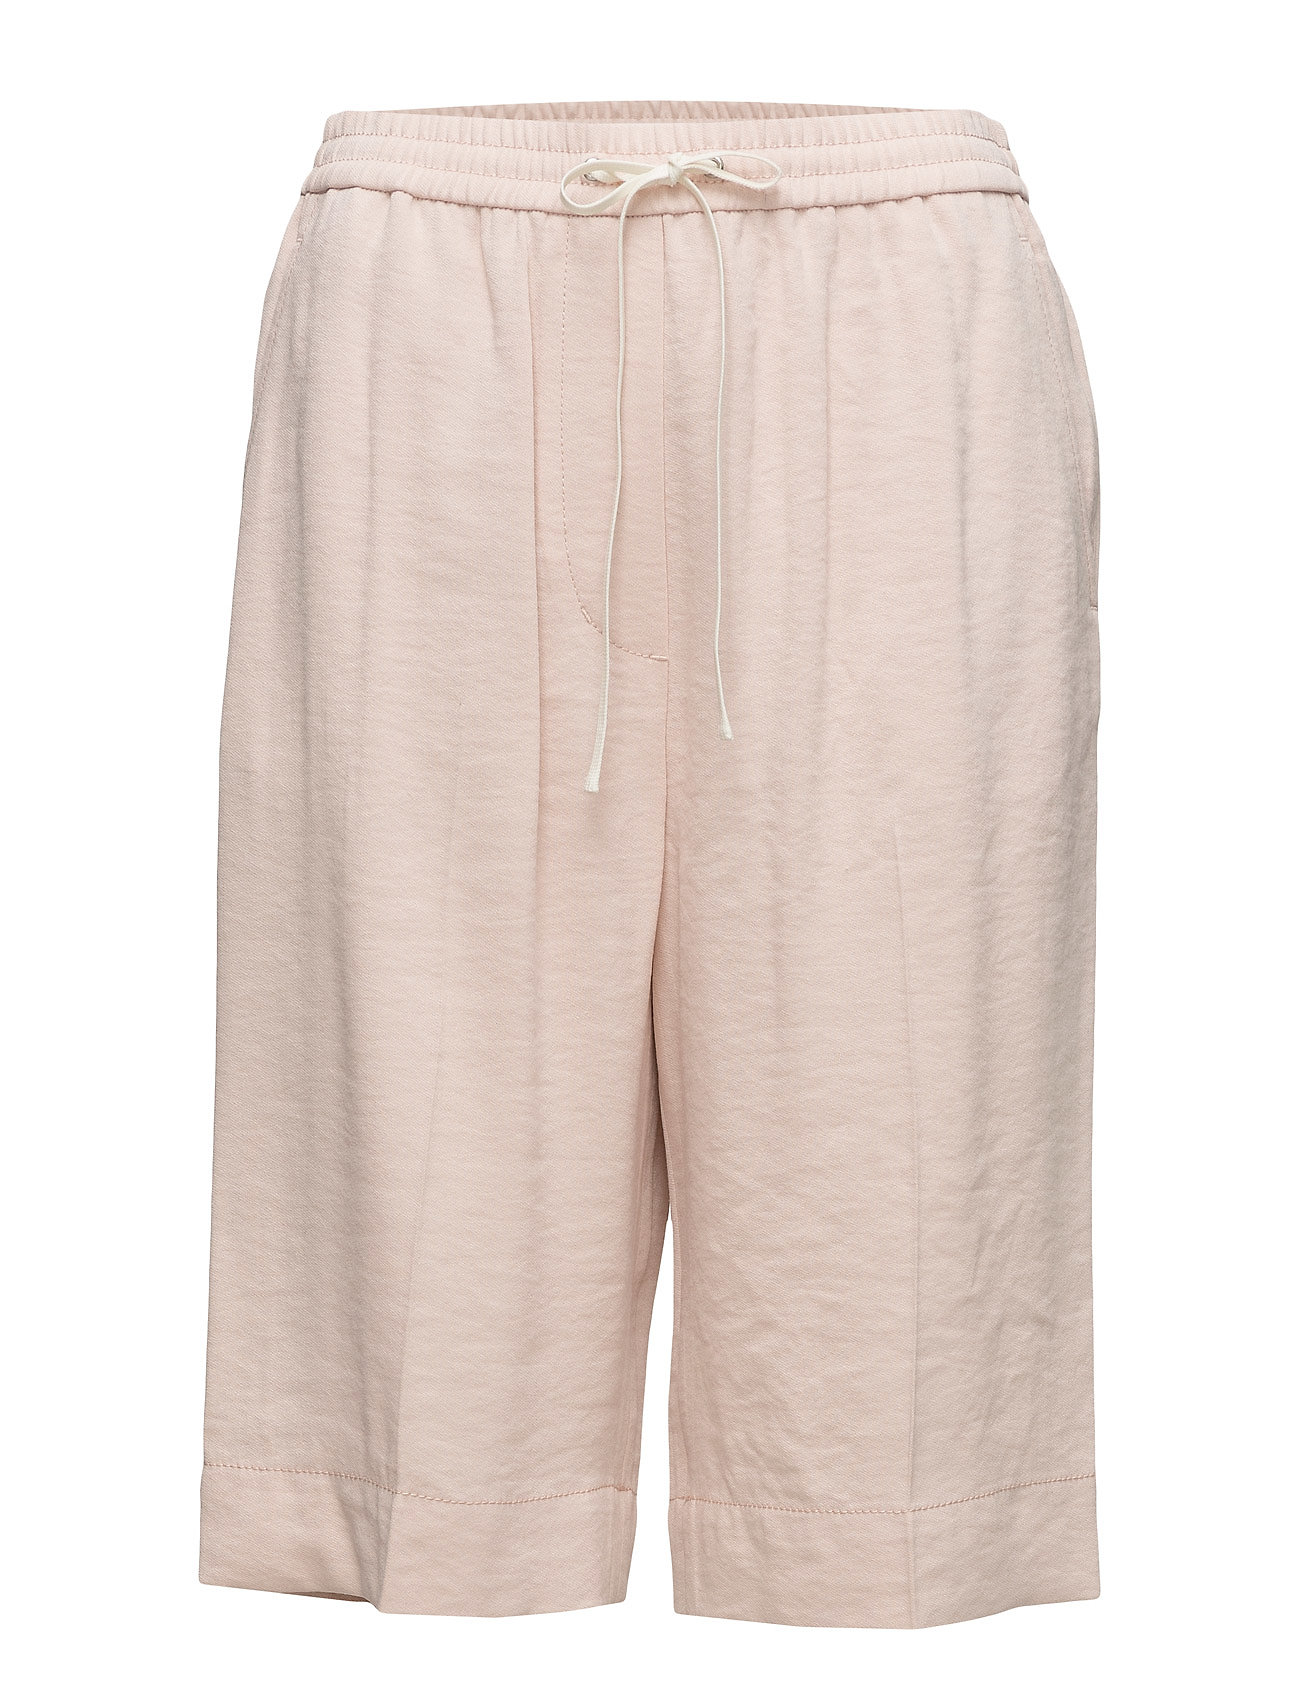 Bermuda Shorts-Crepe thumbnail